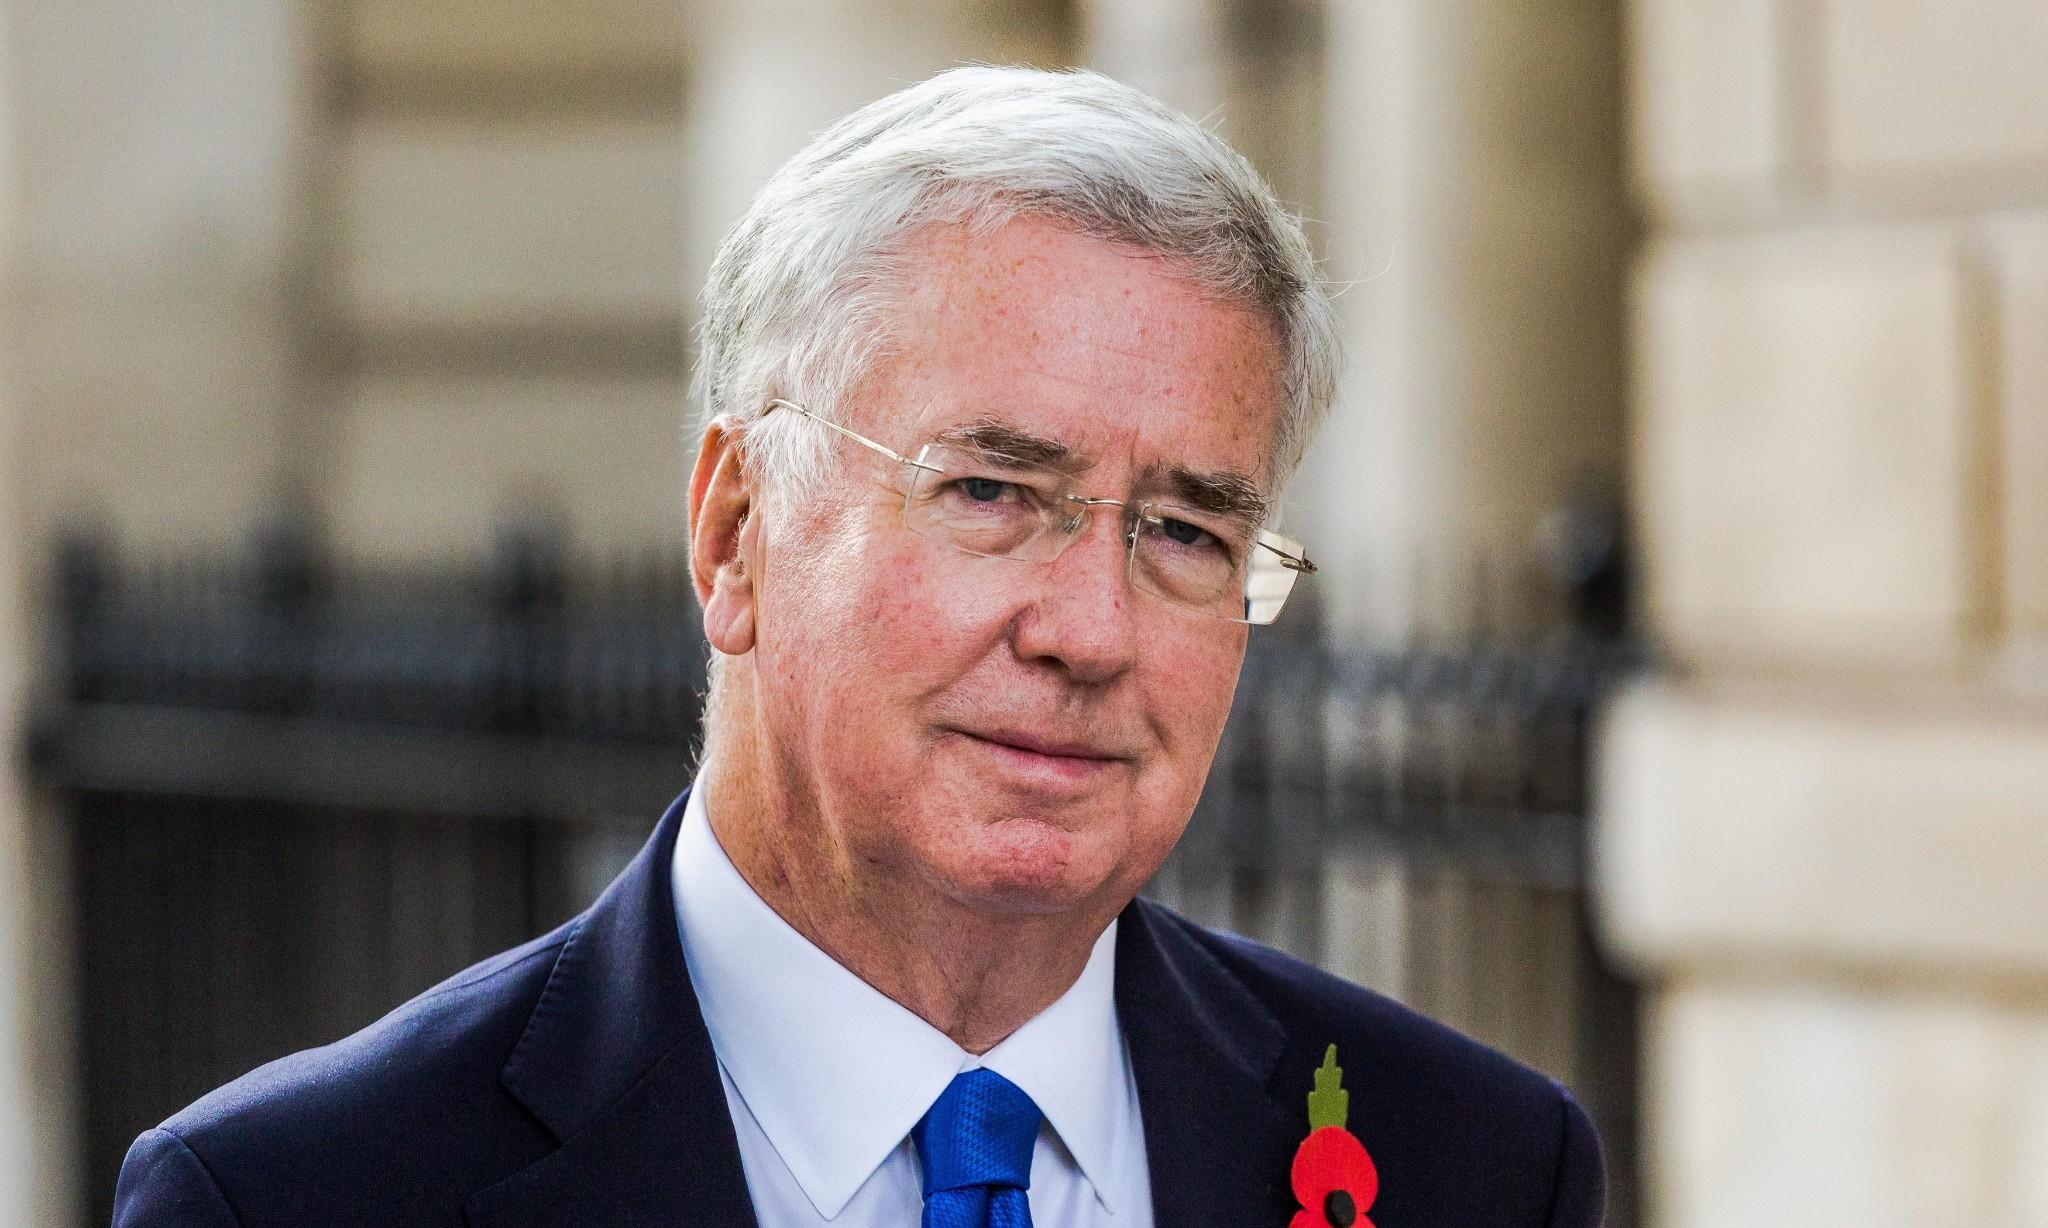 Michael Fallon quits as defence secretary, saying his behaviour has 'fallen short'